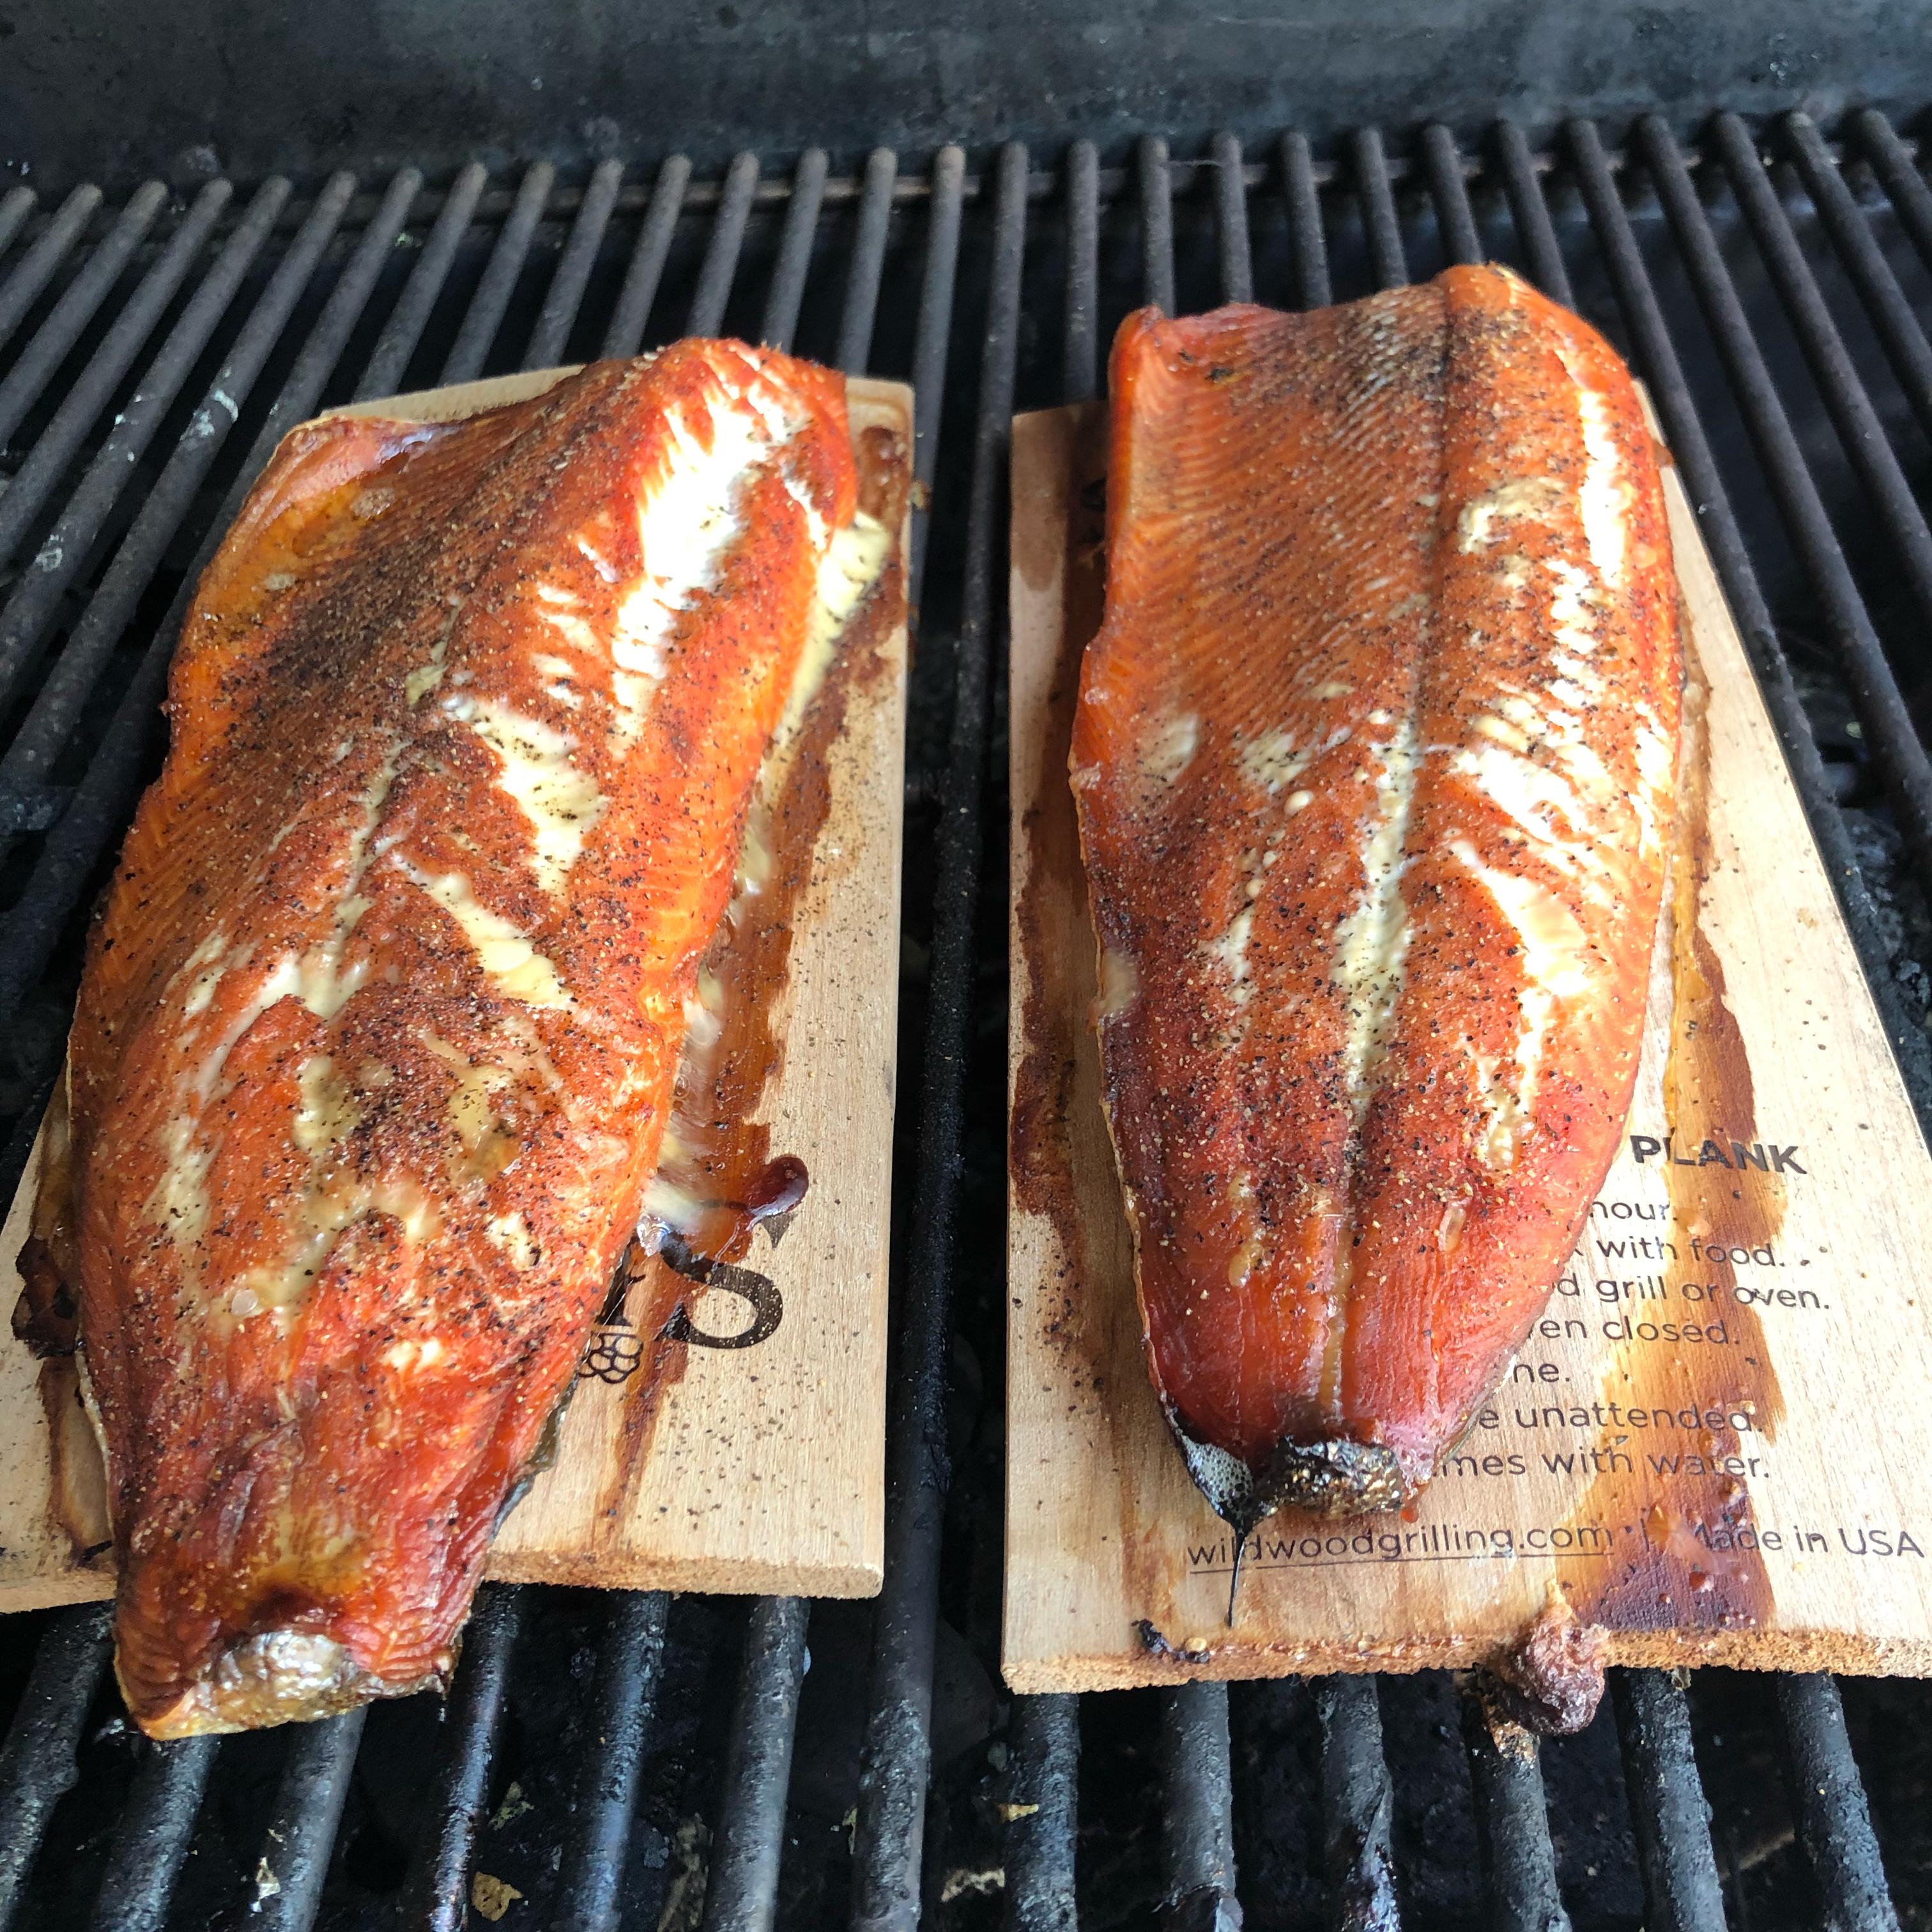 Alder Plank Smoked Salmon Fabiola Sanabria Elias